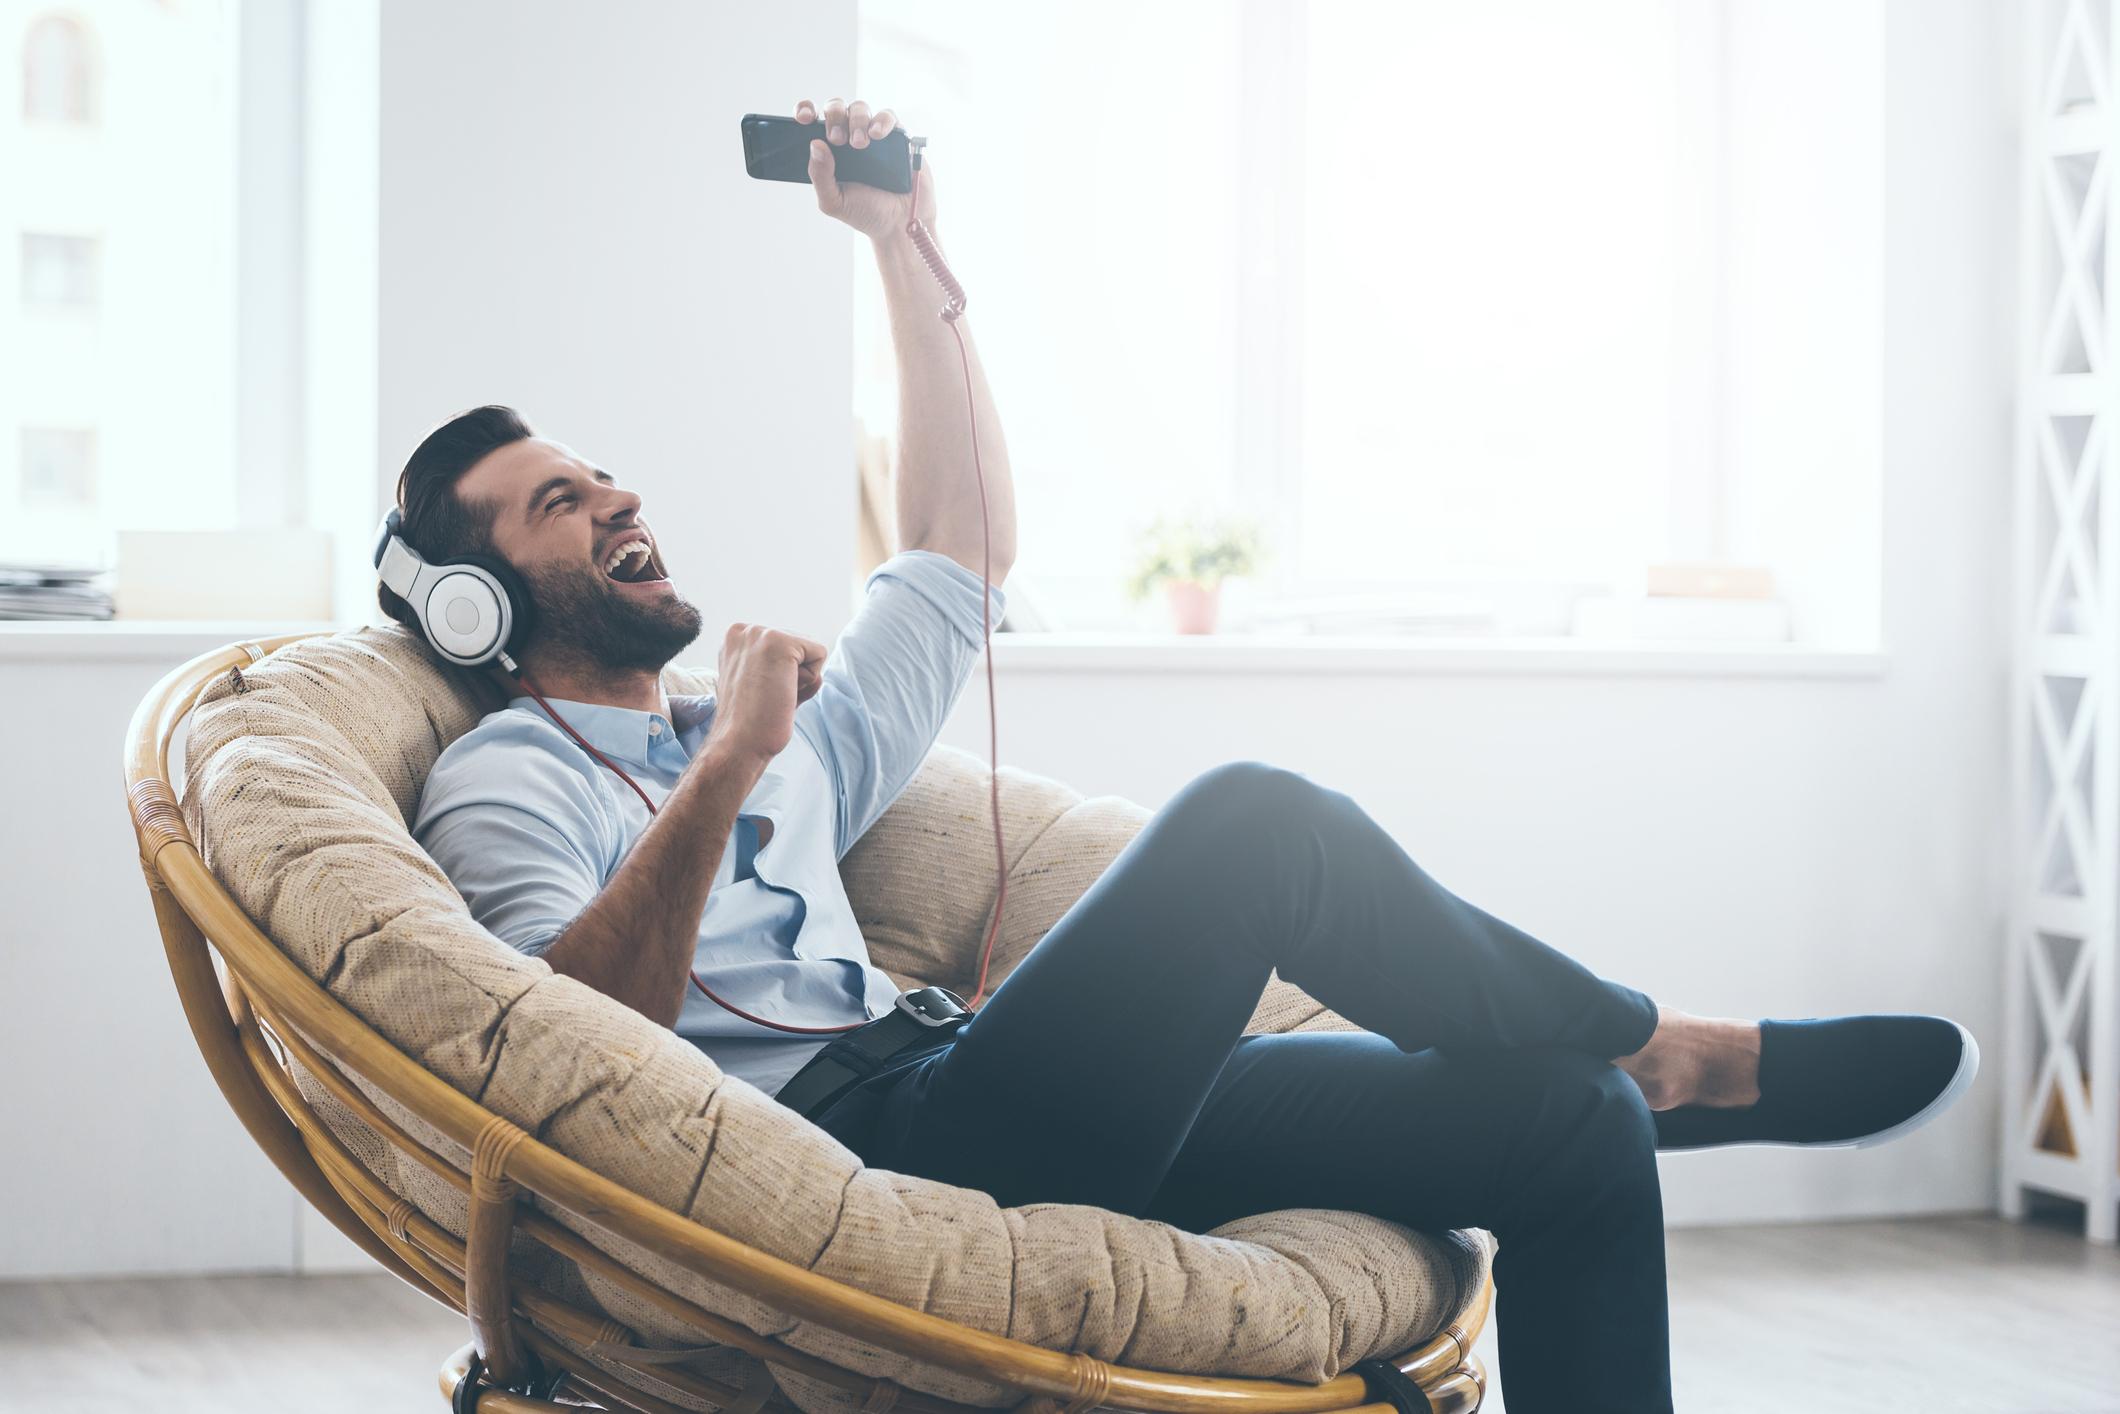 Generic photo of man listening to music (Thinkstock/PA)